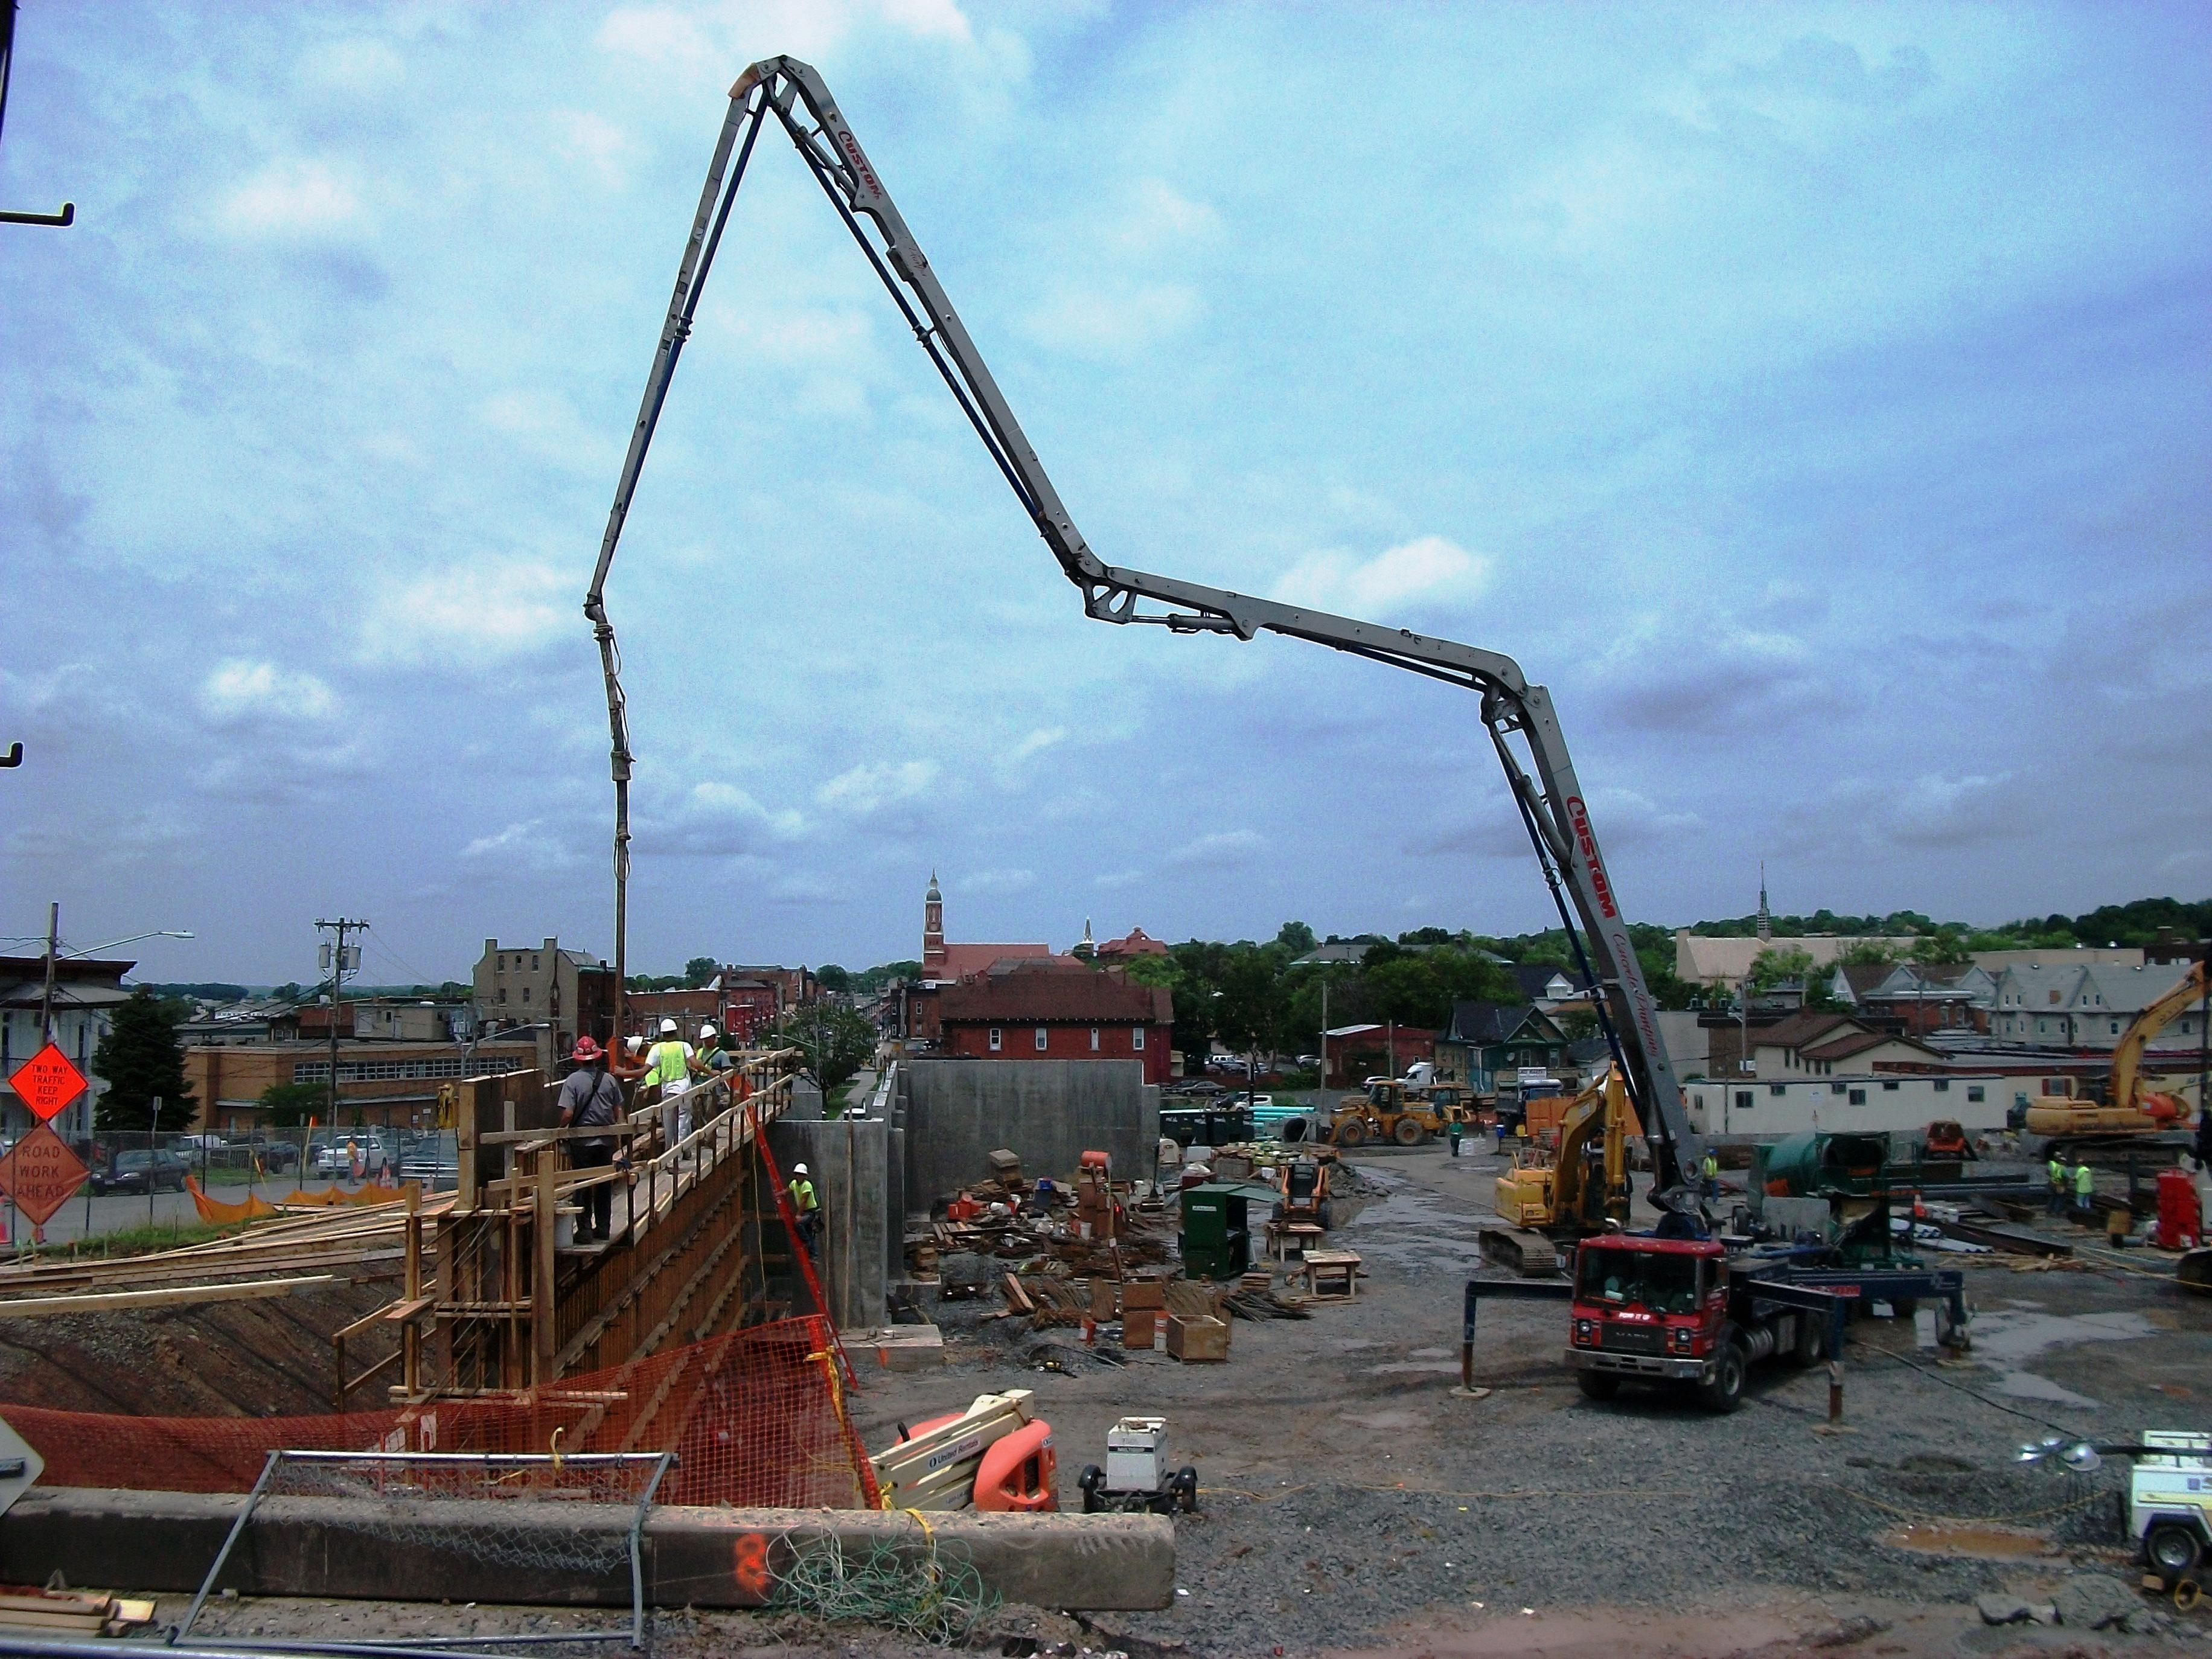 John P. Stopen St. Joseph's Expansion construction